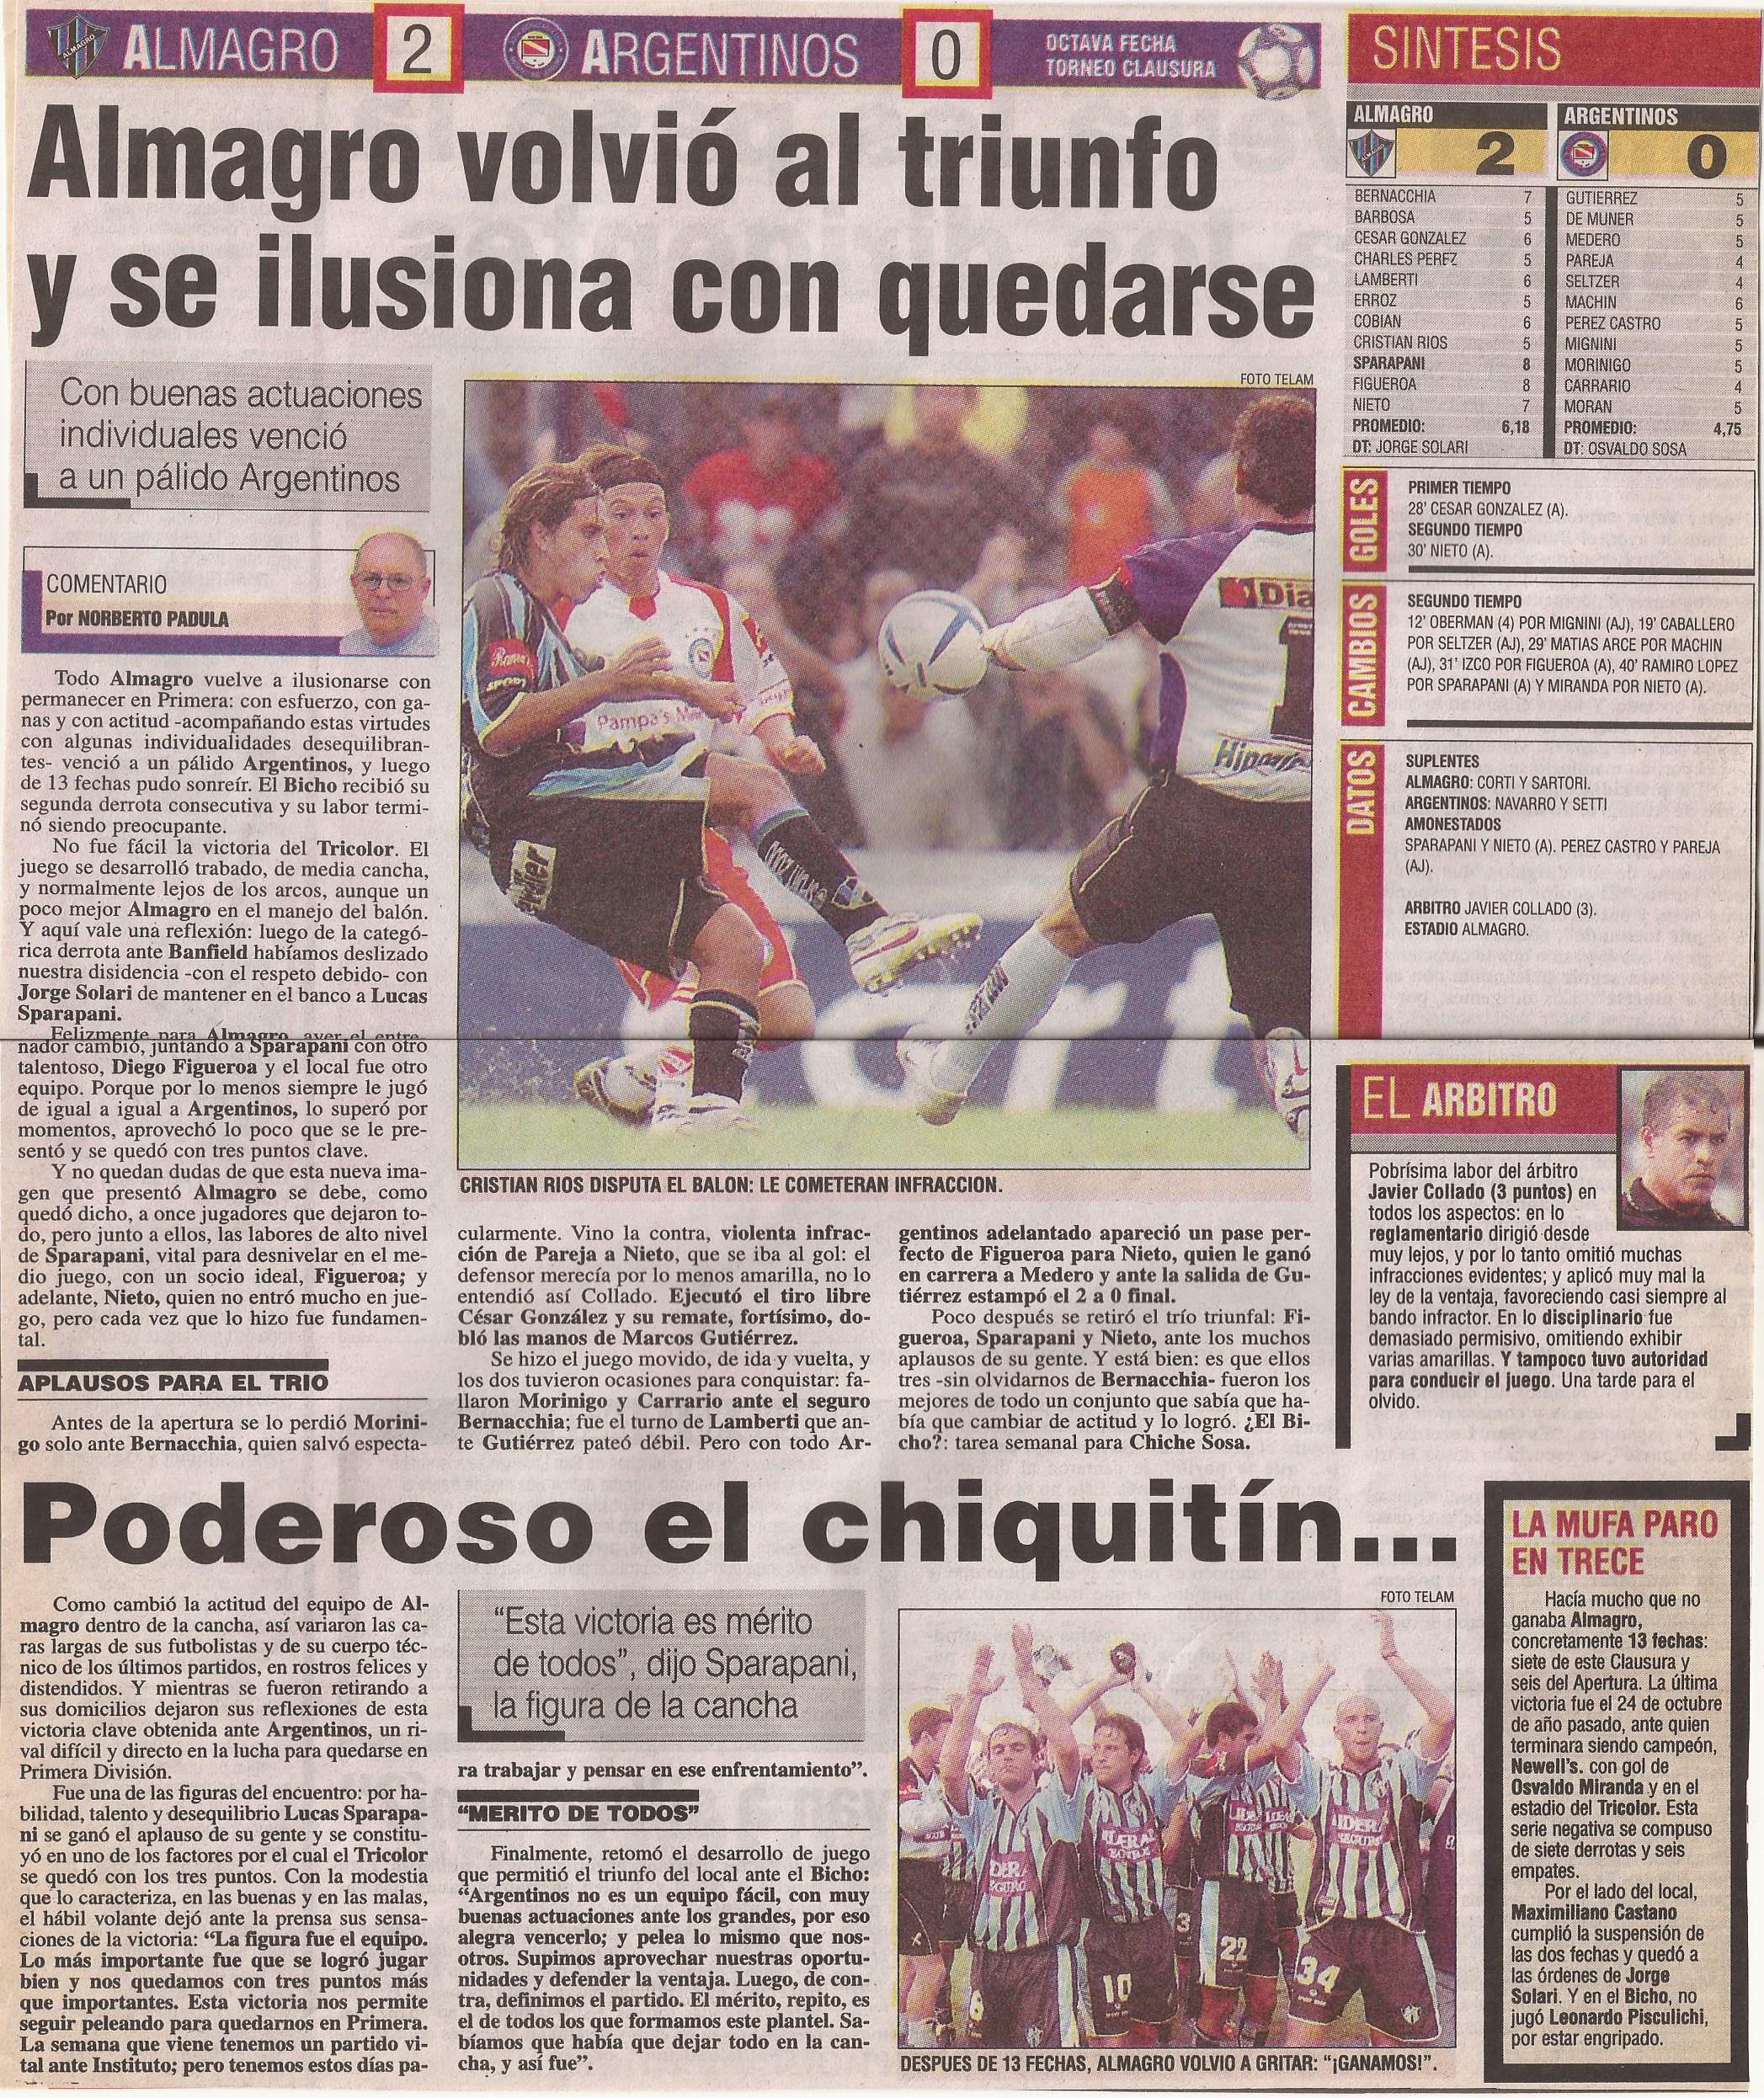 2004-05 Primera Division - Almagro vs Argentino- Diario Popular